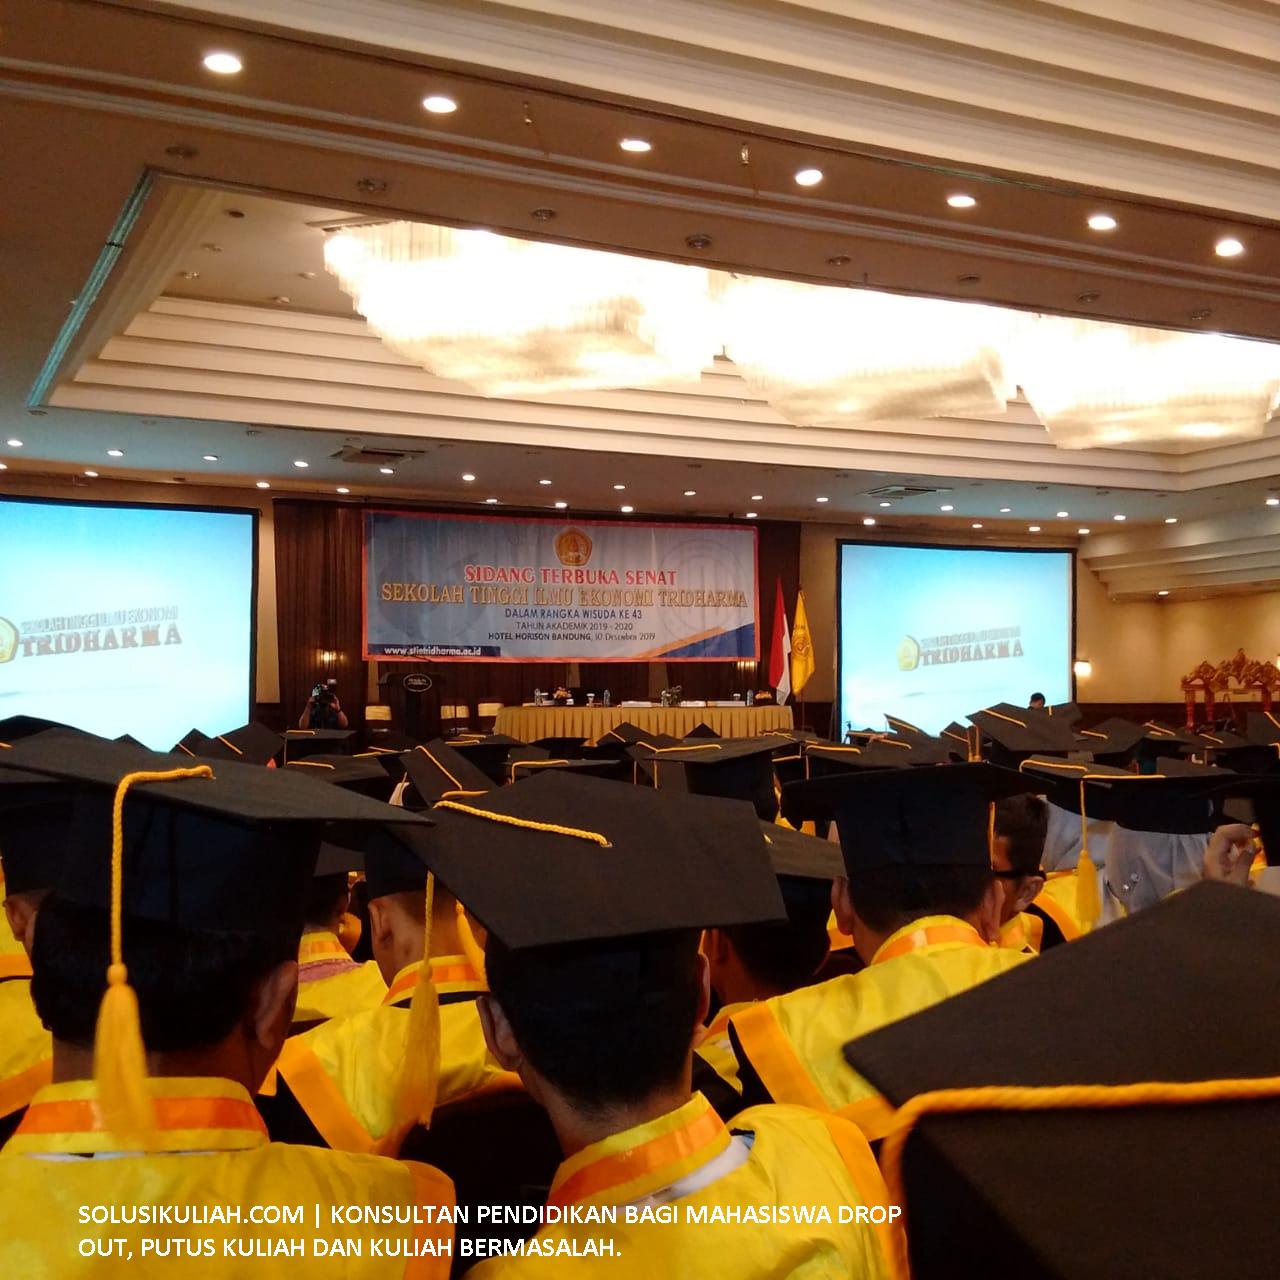 kuliah terbuka, kuliah online, universitas terbuka, biaya kuliah s1